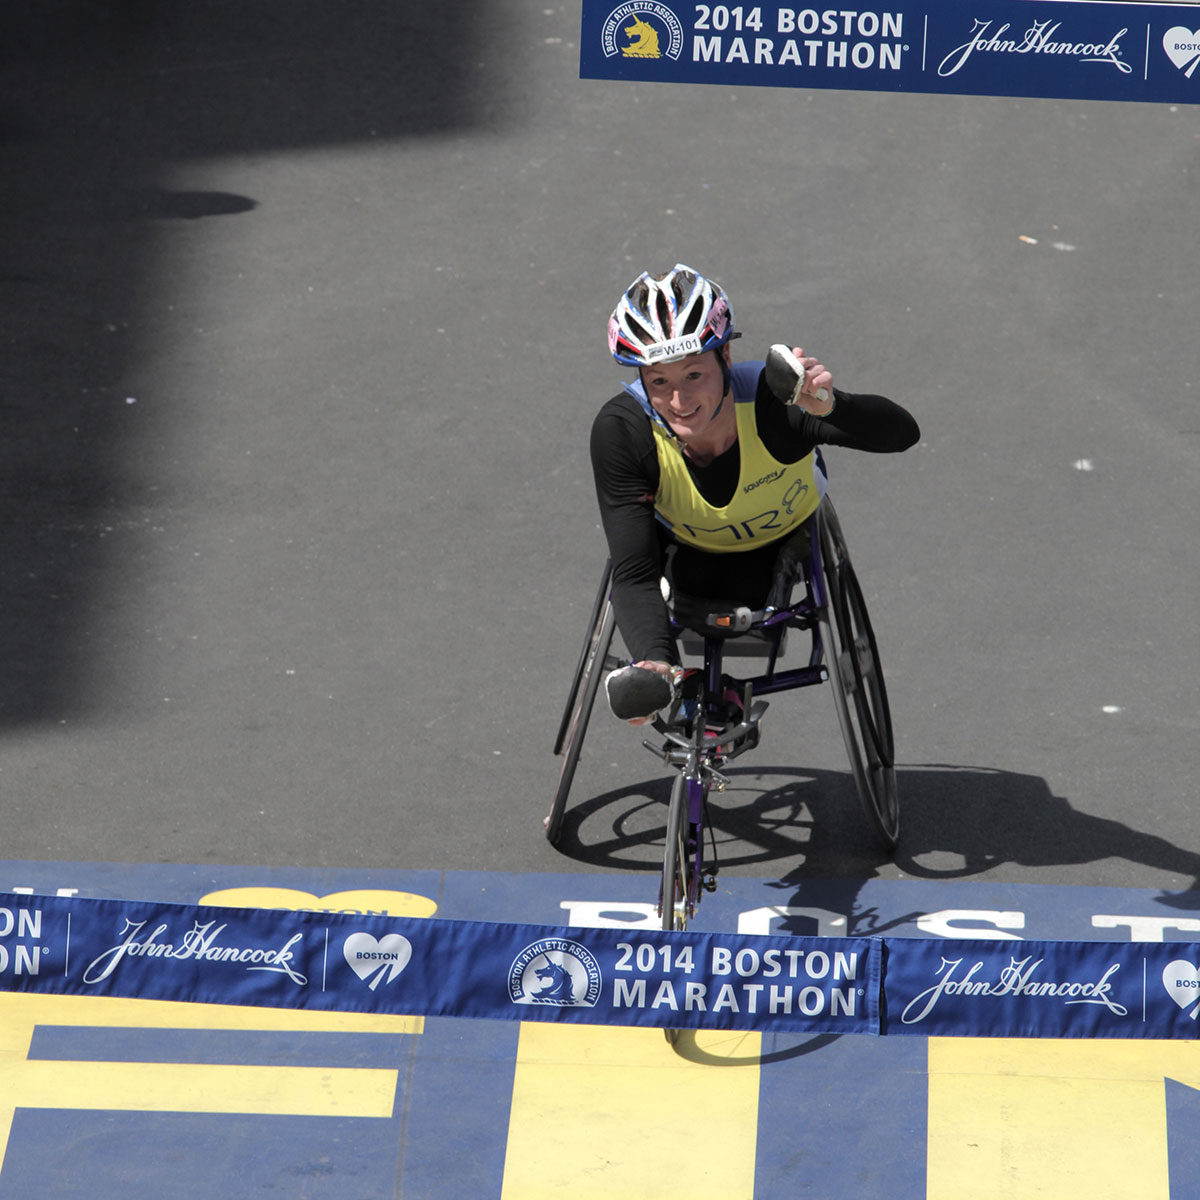 Tatyana McFadden crossing the finish line for her second consecutive Boston Marathon win.